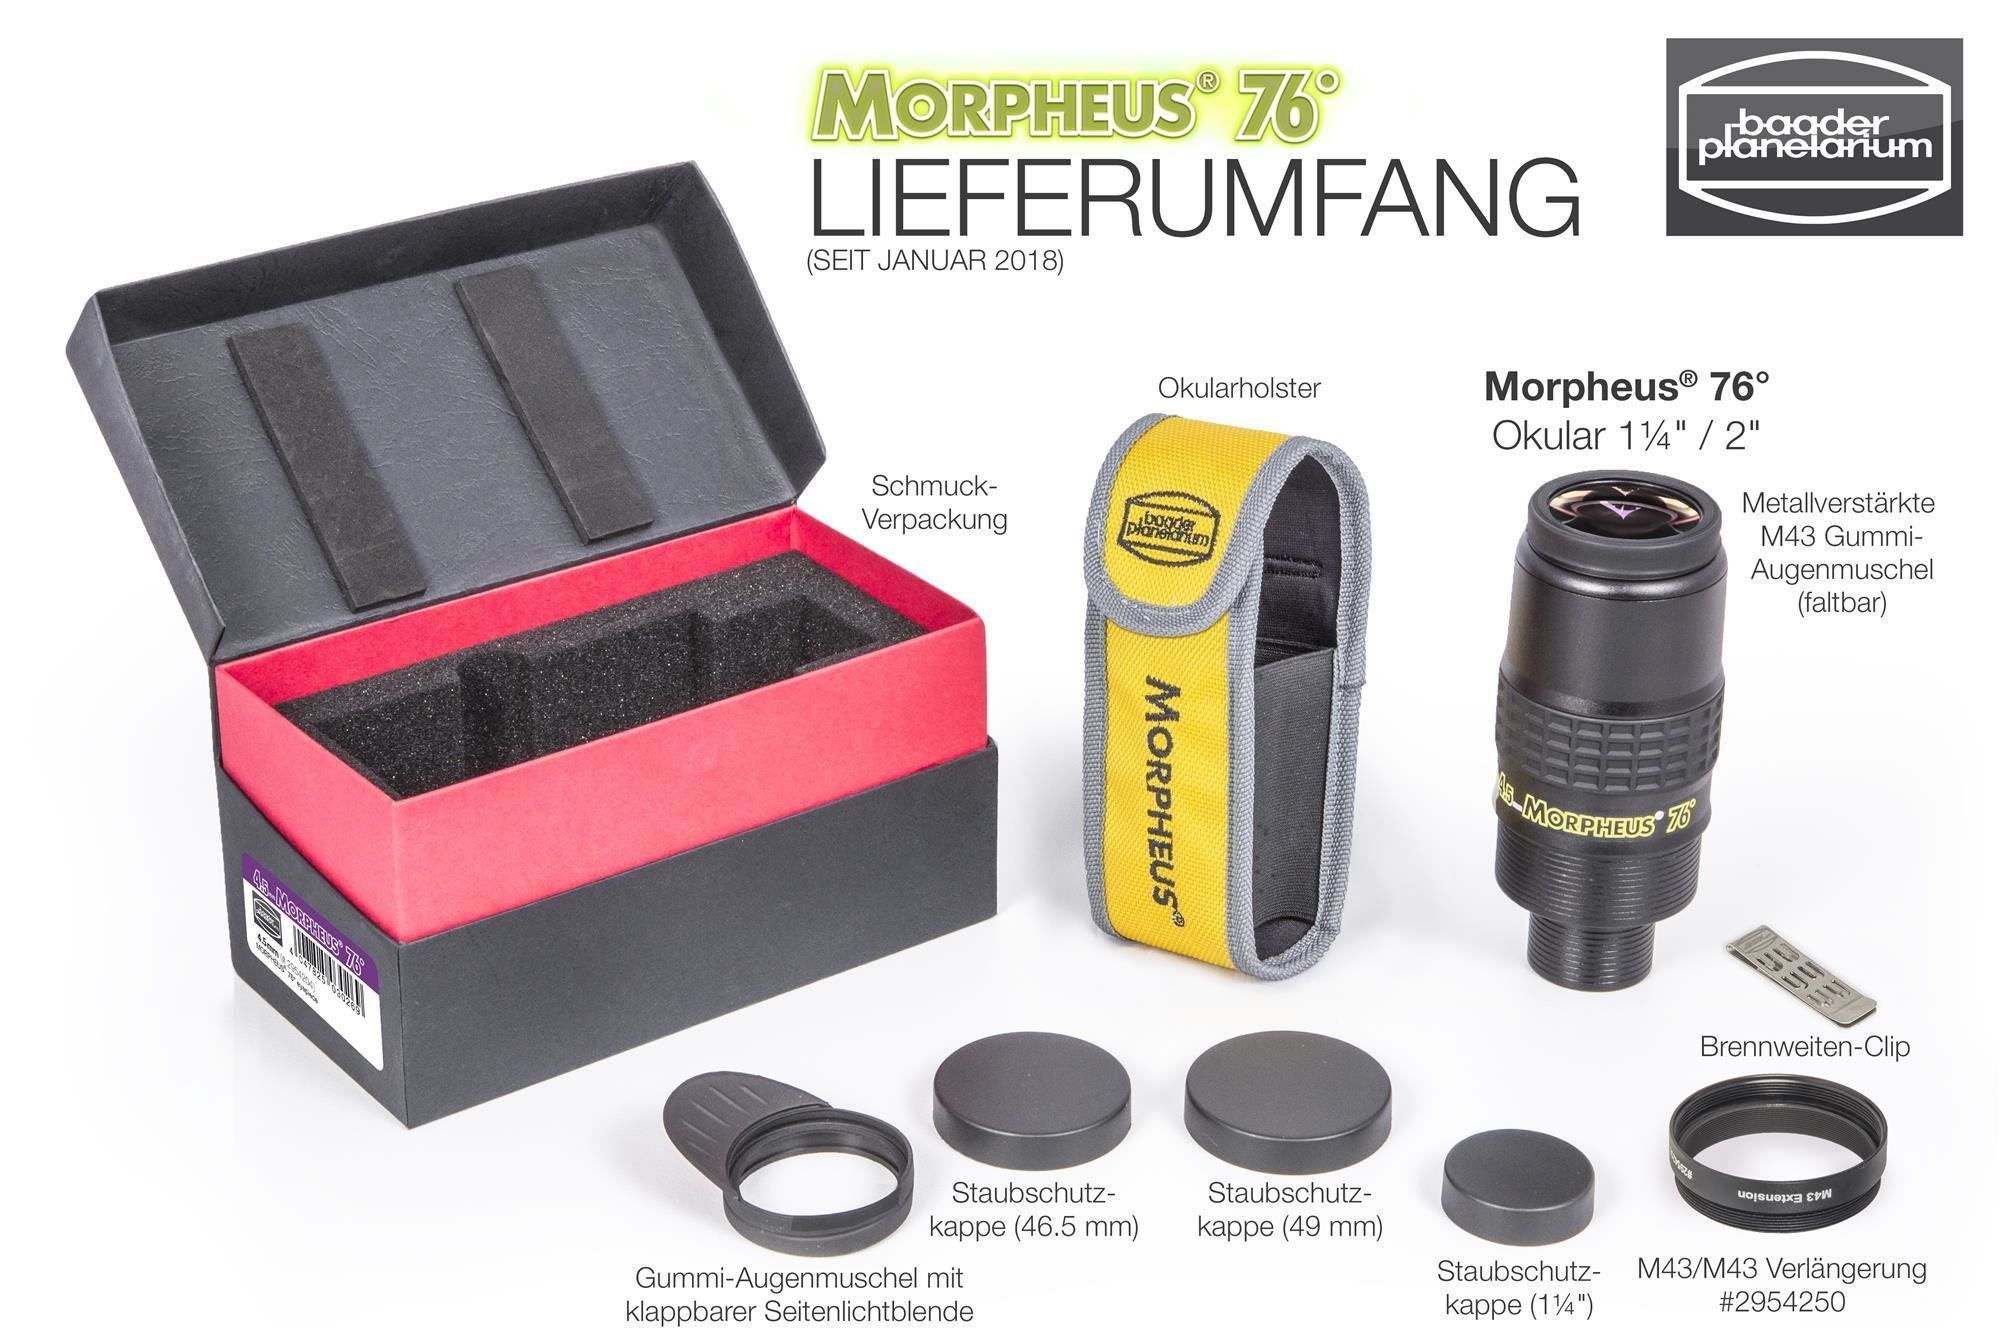 Gesamter Lieferumfang pro Morpheus-Okular